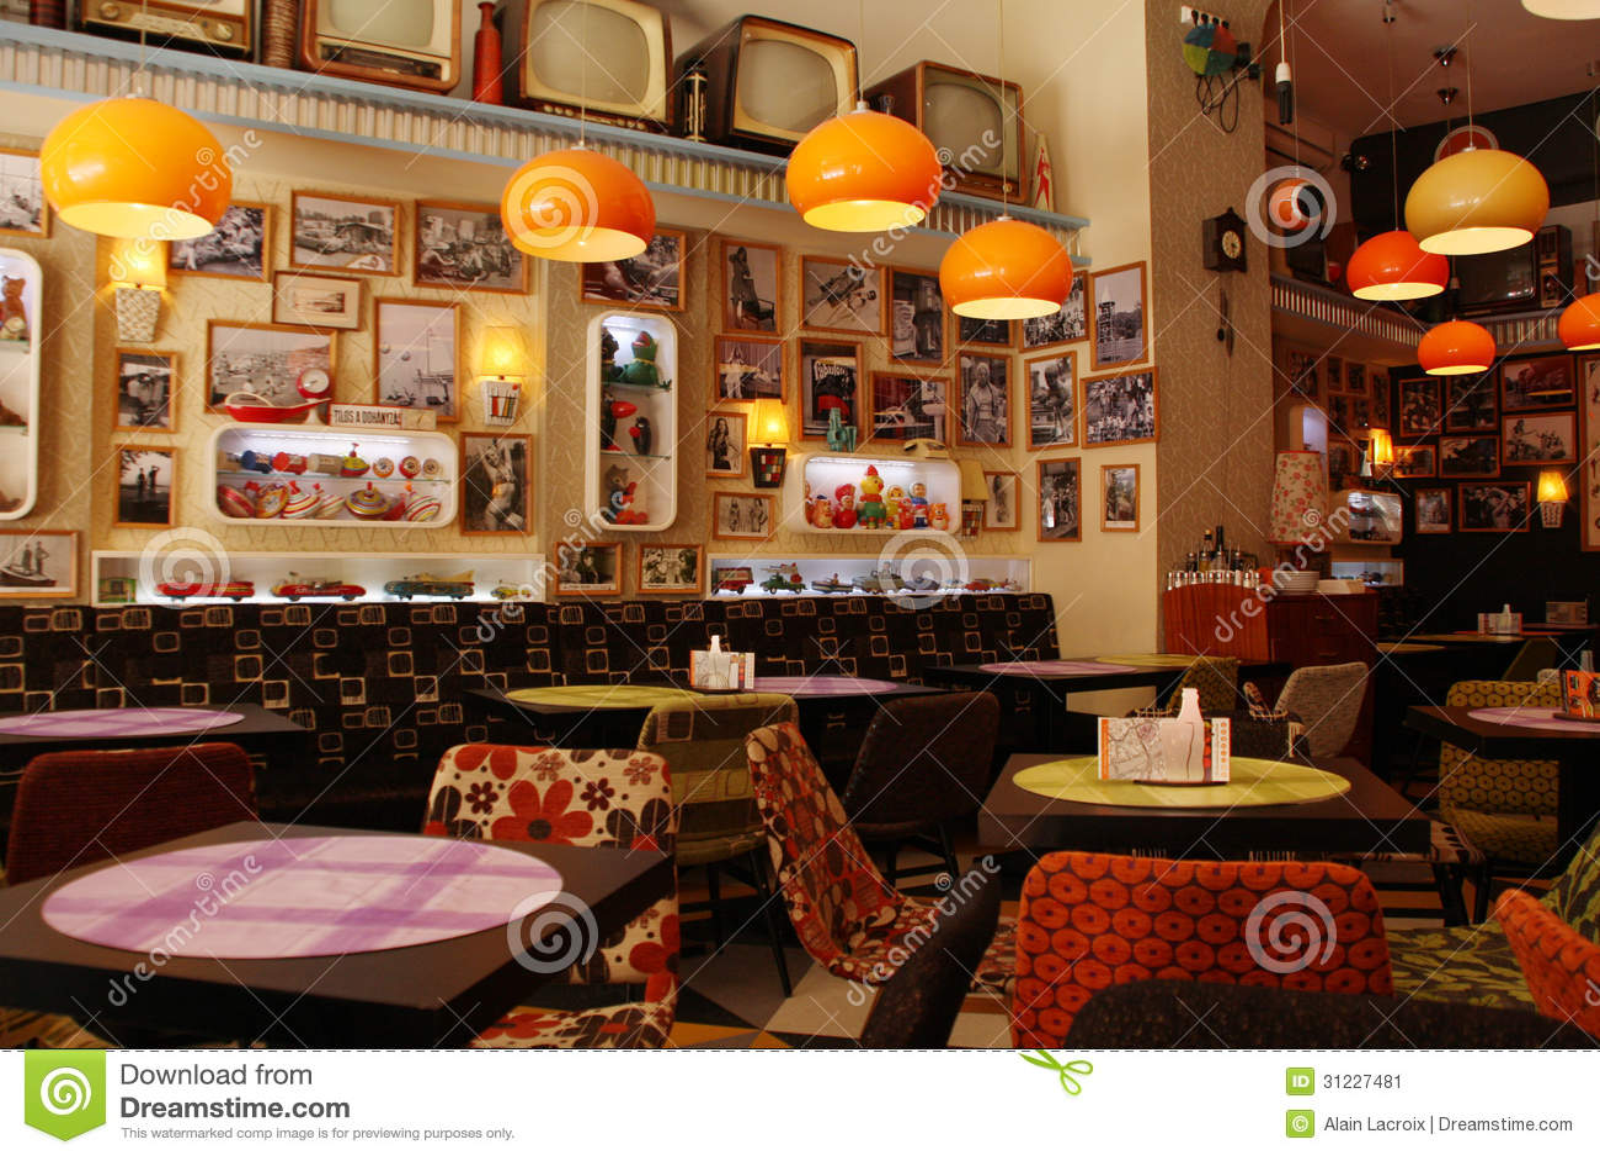 Retro editorial photo image 31227481 for Design interior cafe vintage